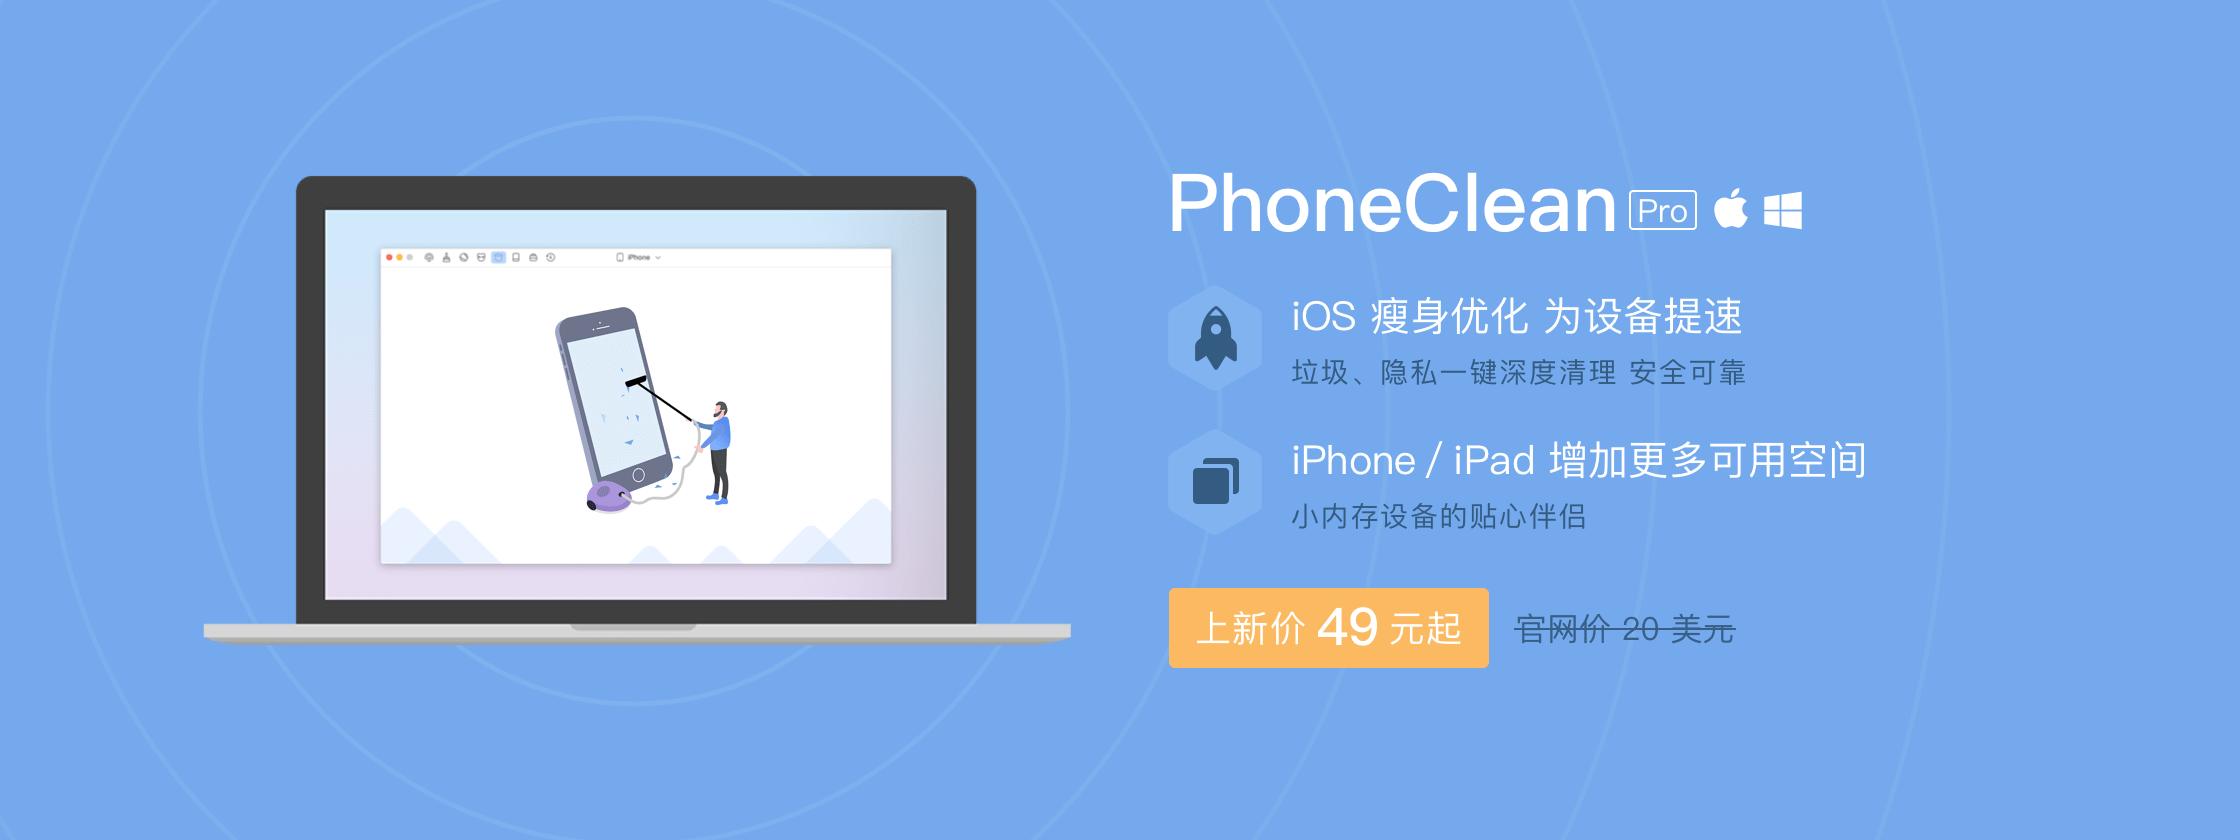 PhoneClean – 安全可靠的 iOS 垃圾清理工具